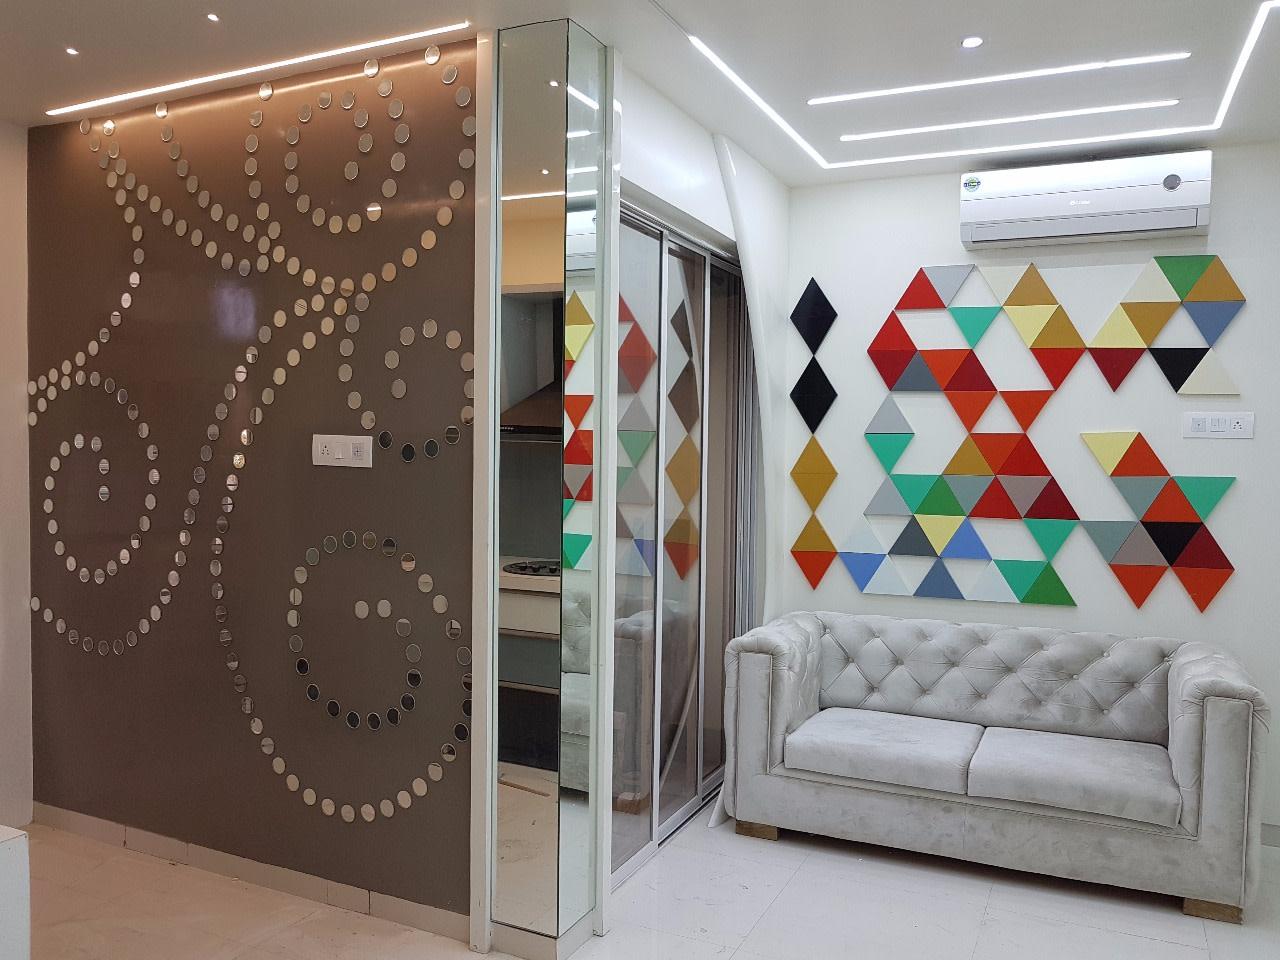 Contemporary Display Unit by Alaya D'decor  Living-room Contemporary | Interior Design Photos & Ideas